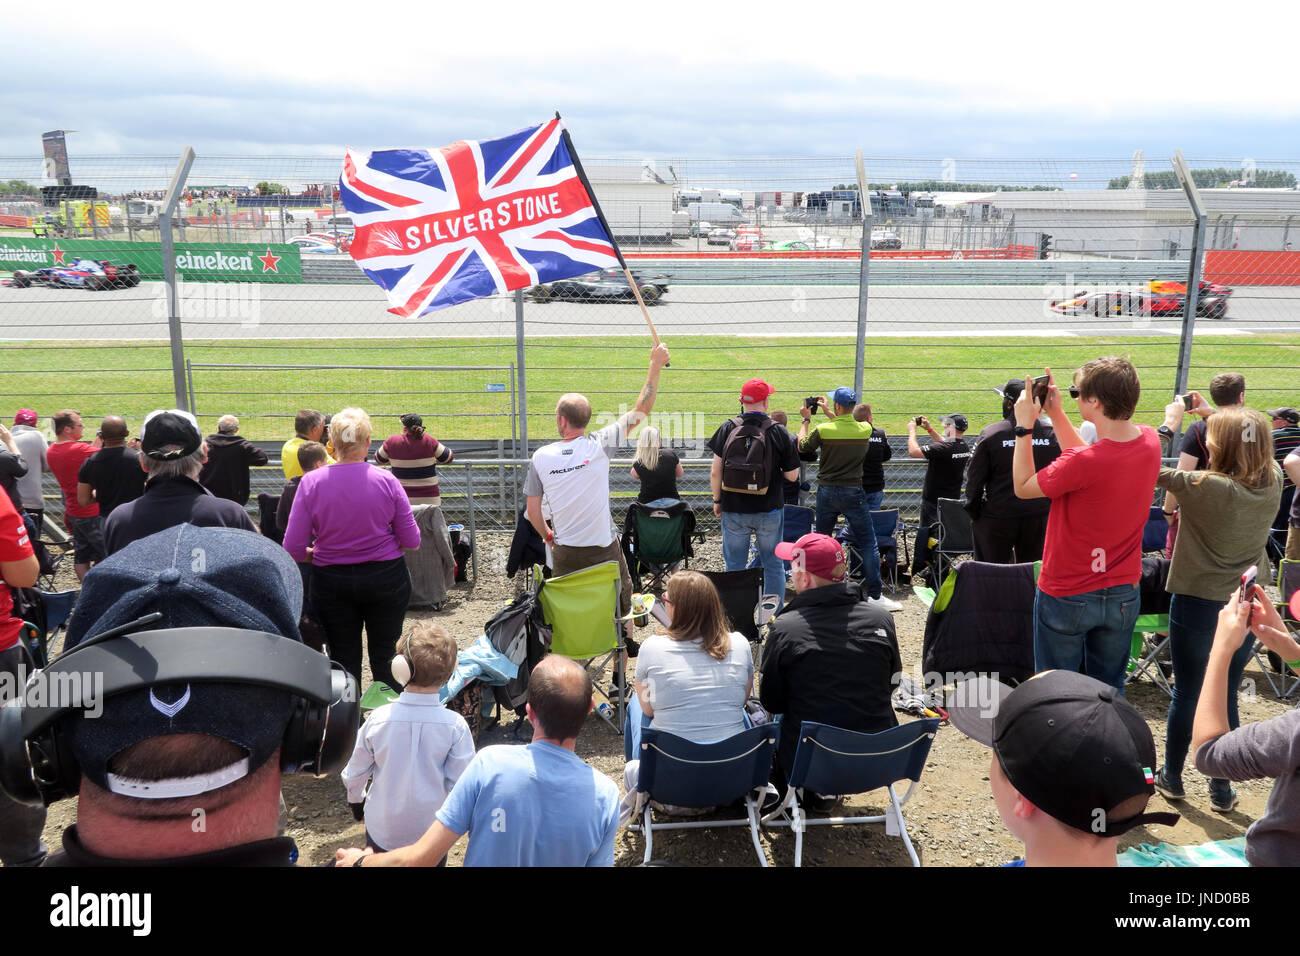 Silverstone Flag at Formula1 racing circuit - Stock Image